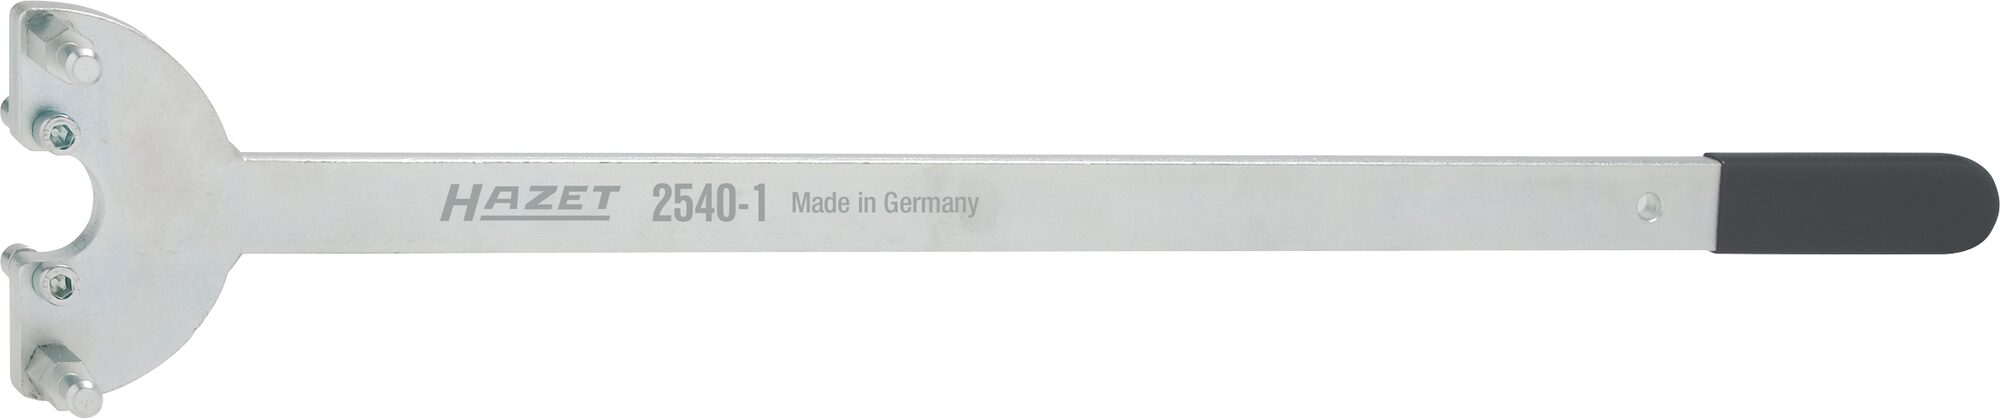 HAZET Zahnriemenrad-Gegenhalter 2540-1